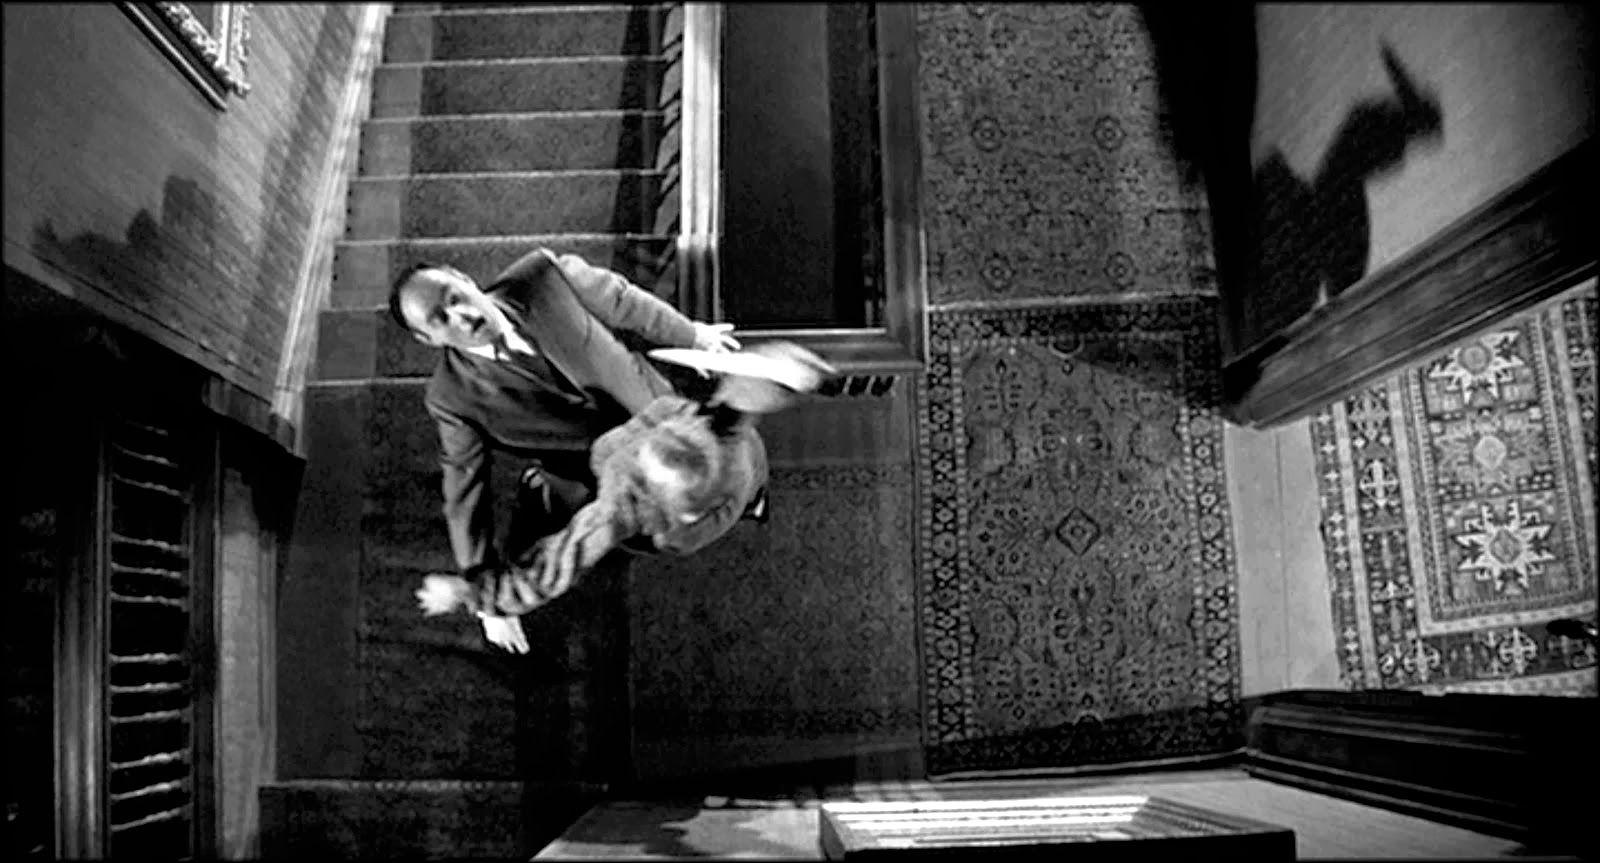 http://www.kinopitheque.net/wp-content/uploads/2015/10/Hitchcock-Psychose.jpg